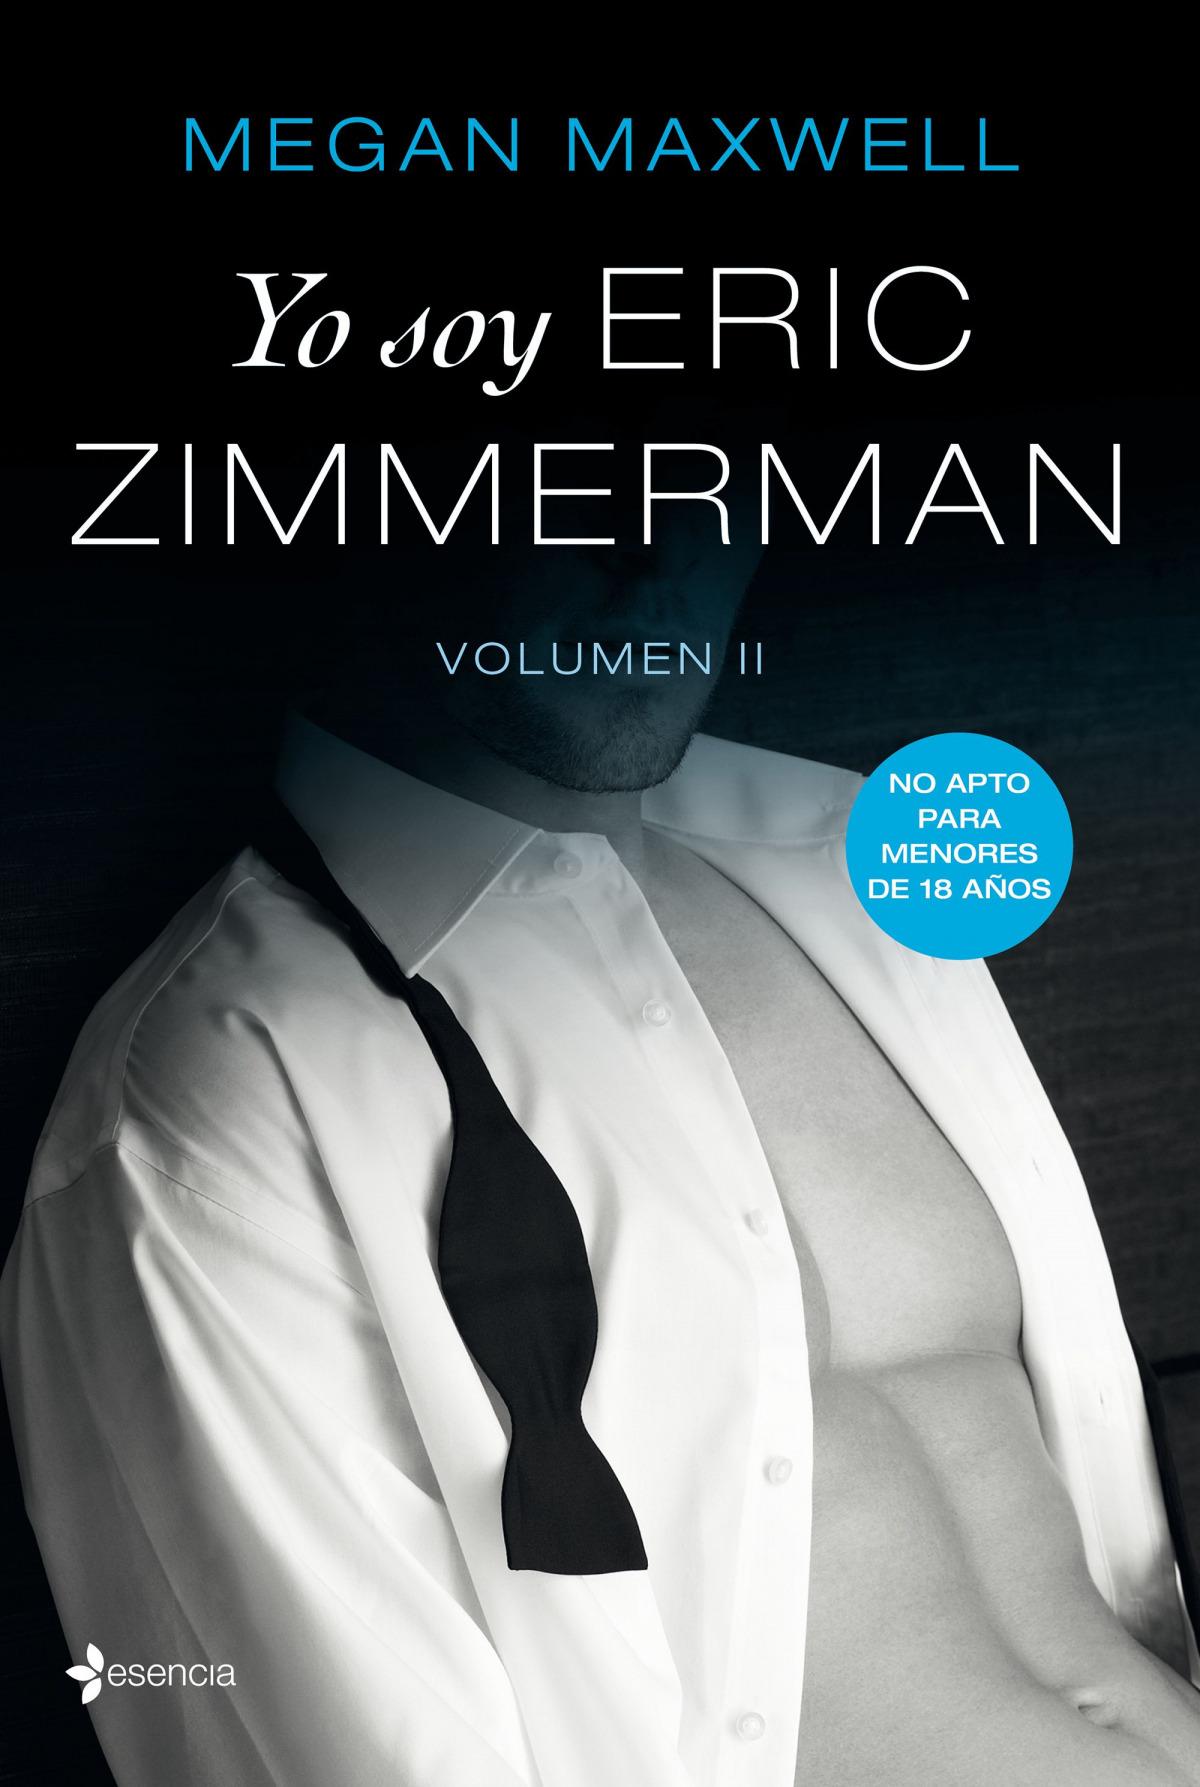 YO SOY ERIC ZIMMERMAN VOLUMEN II 9788408196211